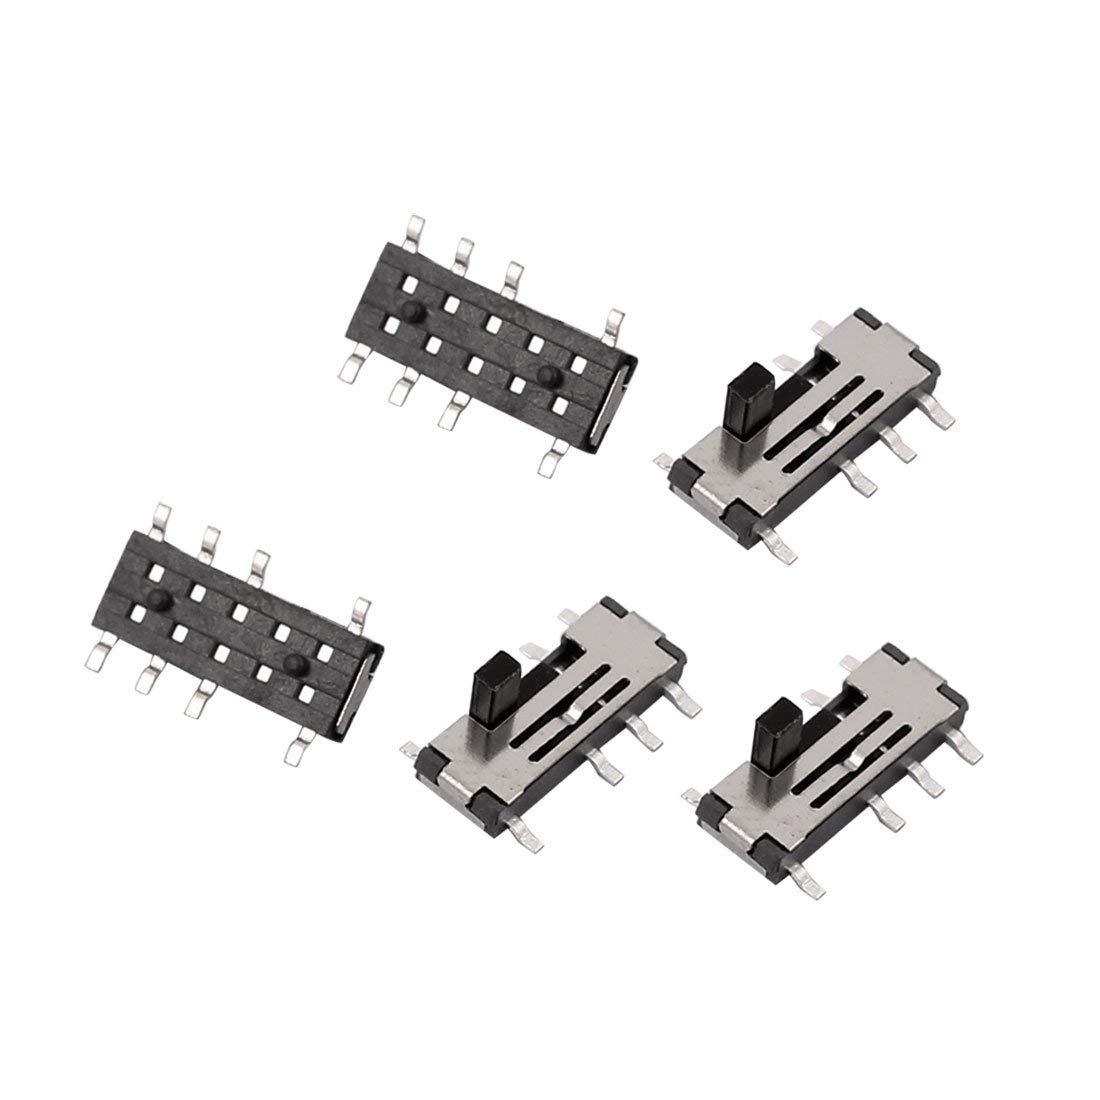 5pcs 3 Position 8P 2P3T SMT SMD Self Locking Mini Power Slide Switch 10x6x3mm Miki&Co